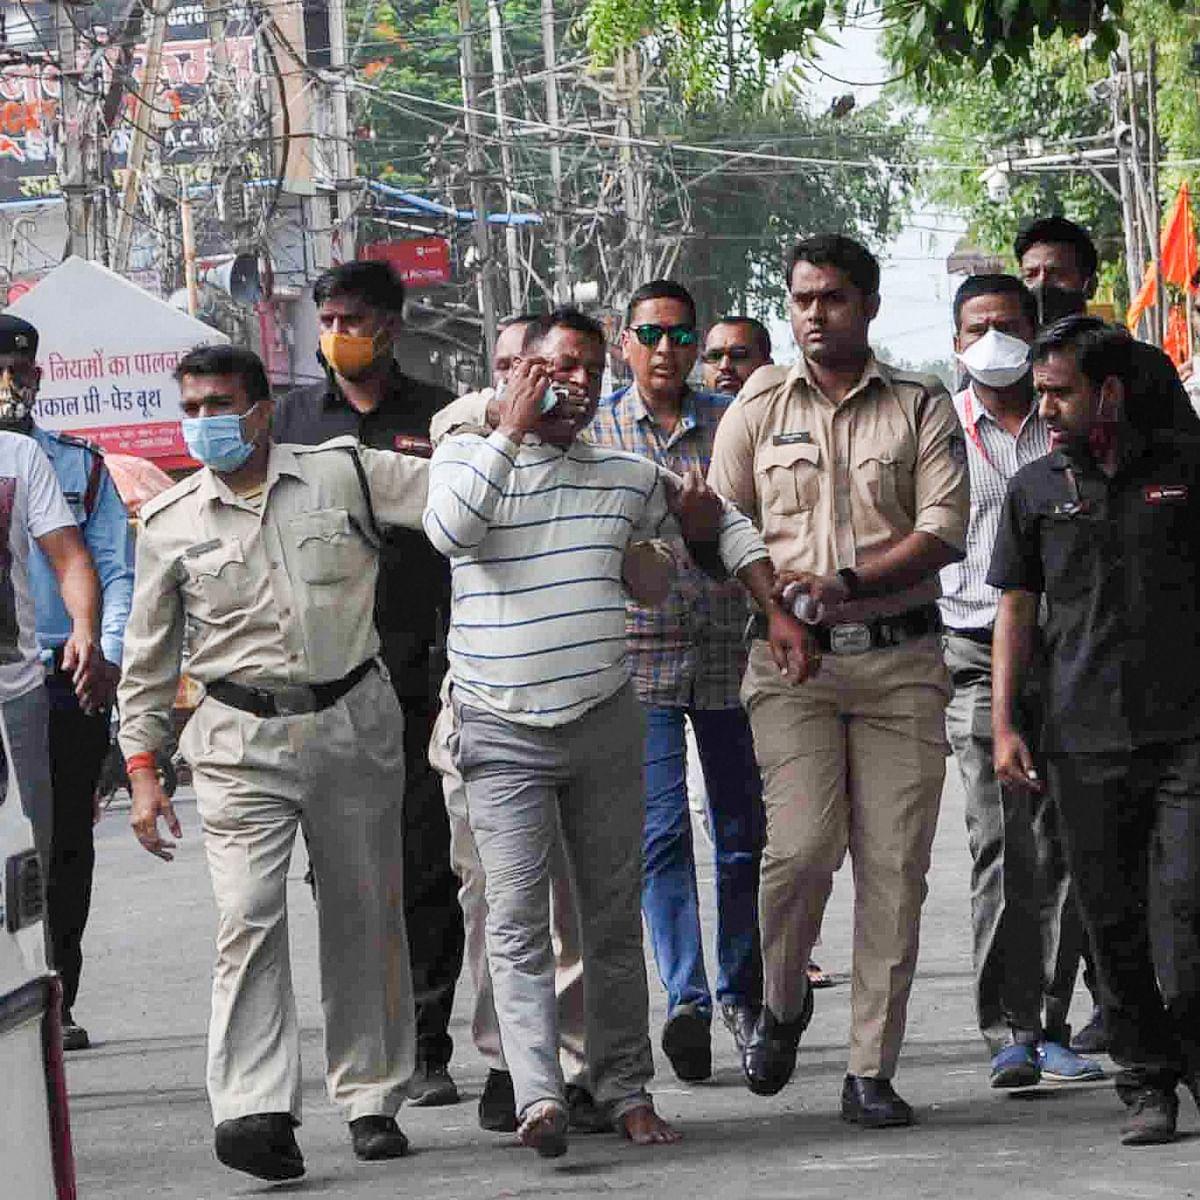 Madhya Pradesh: 2 Gwalior men held for harbouring gangster Vikas Dubey's aides